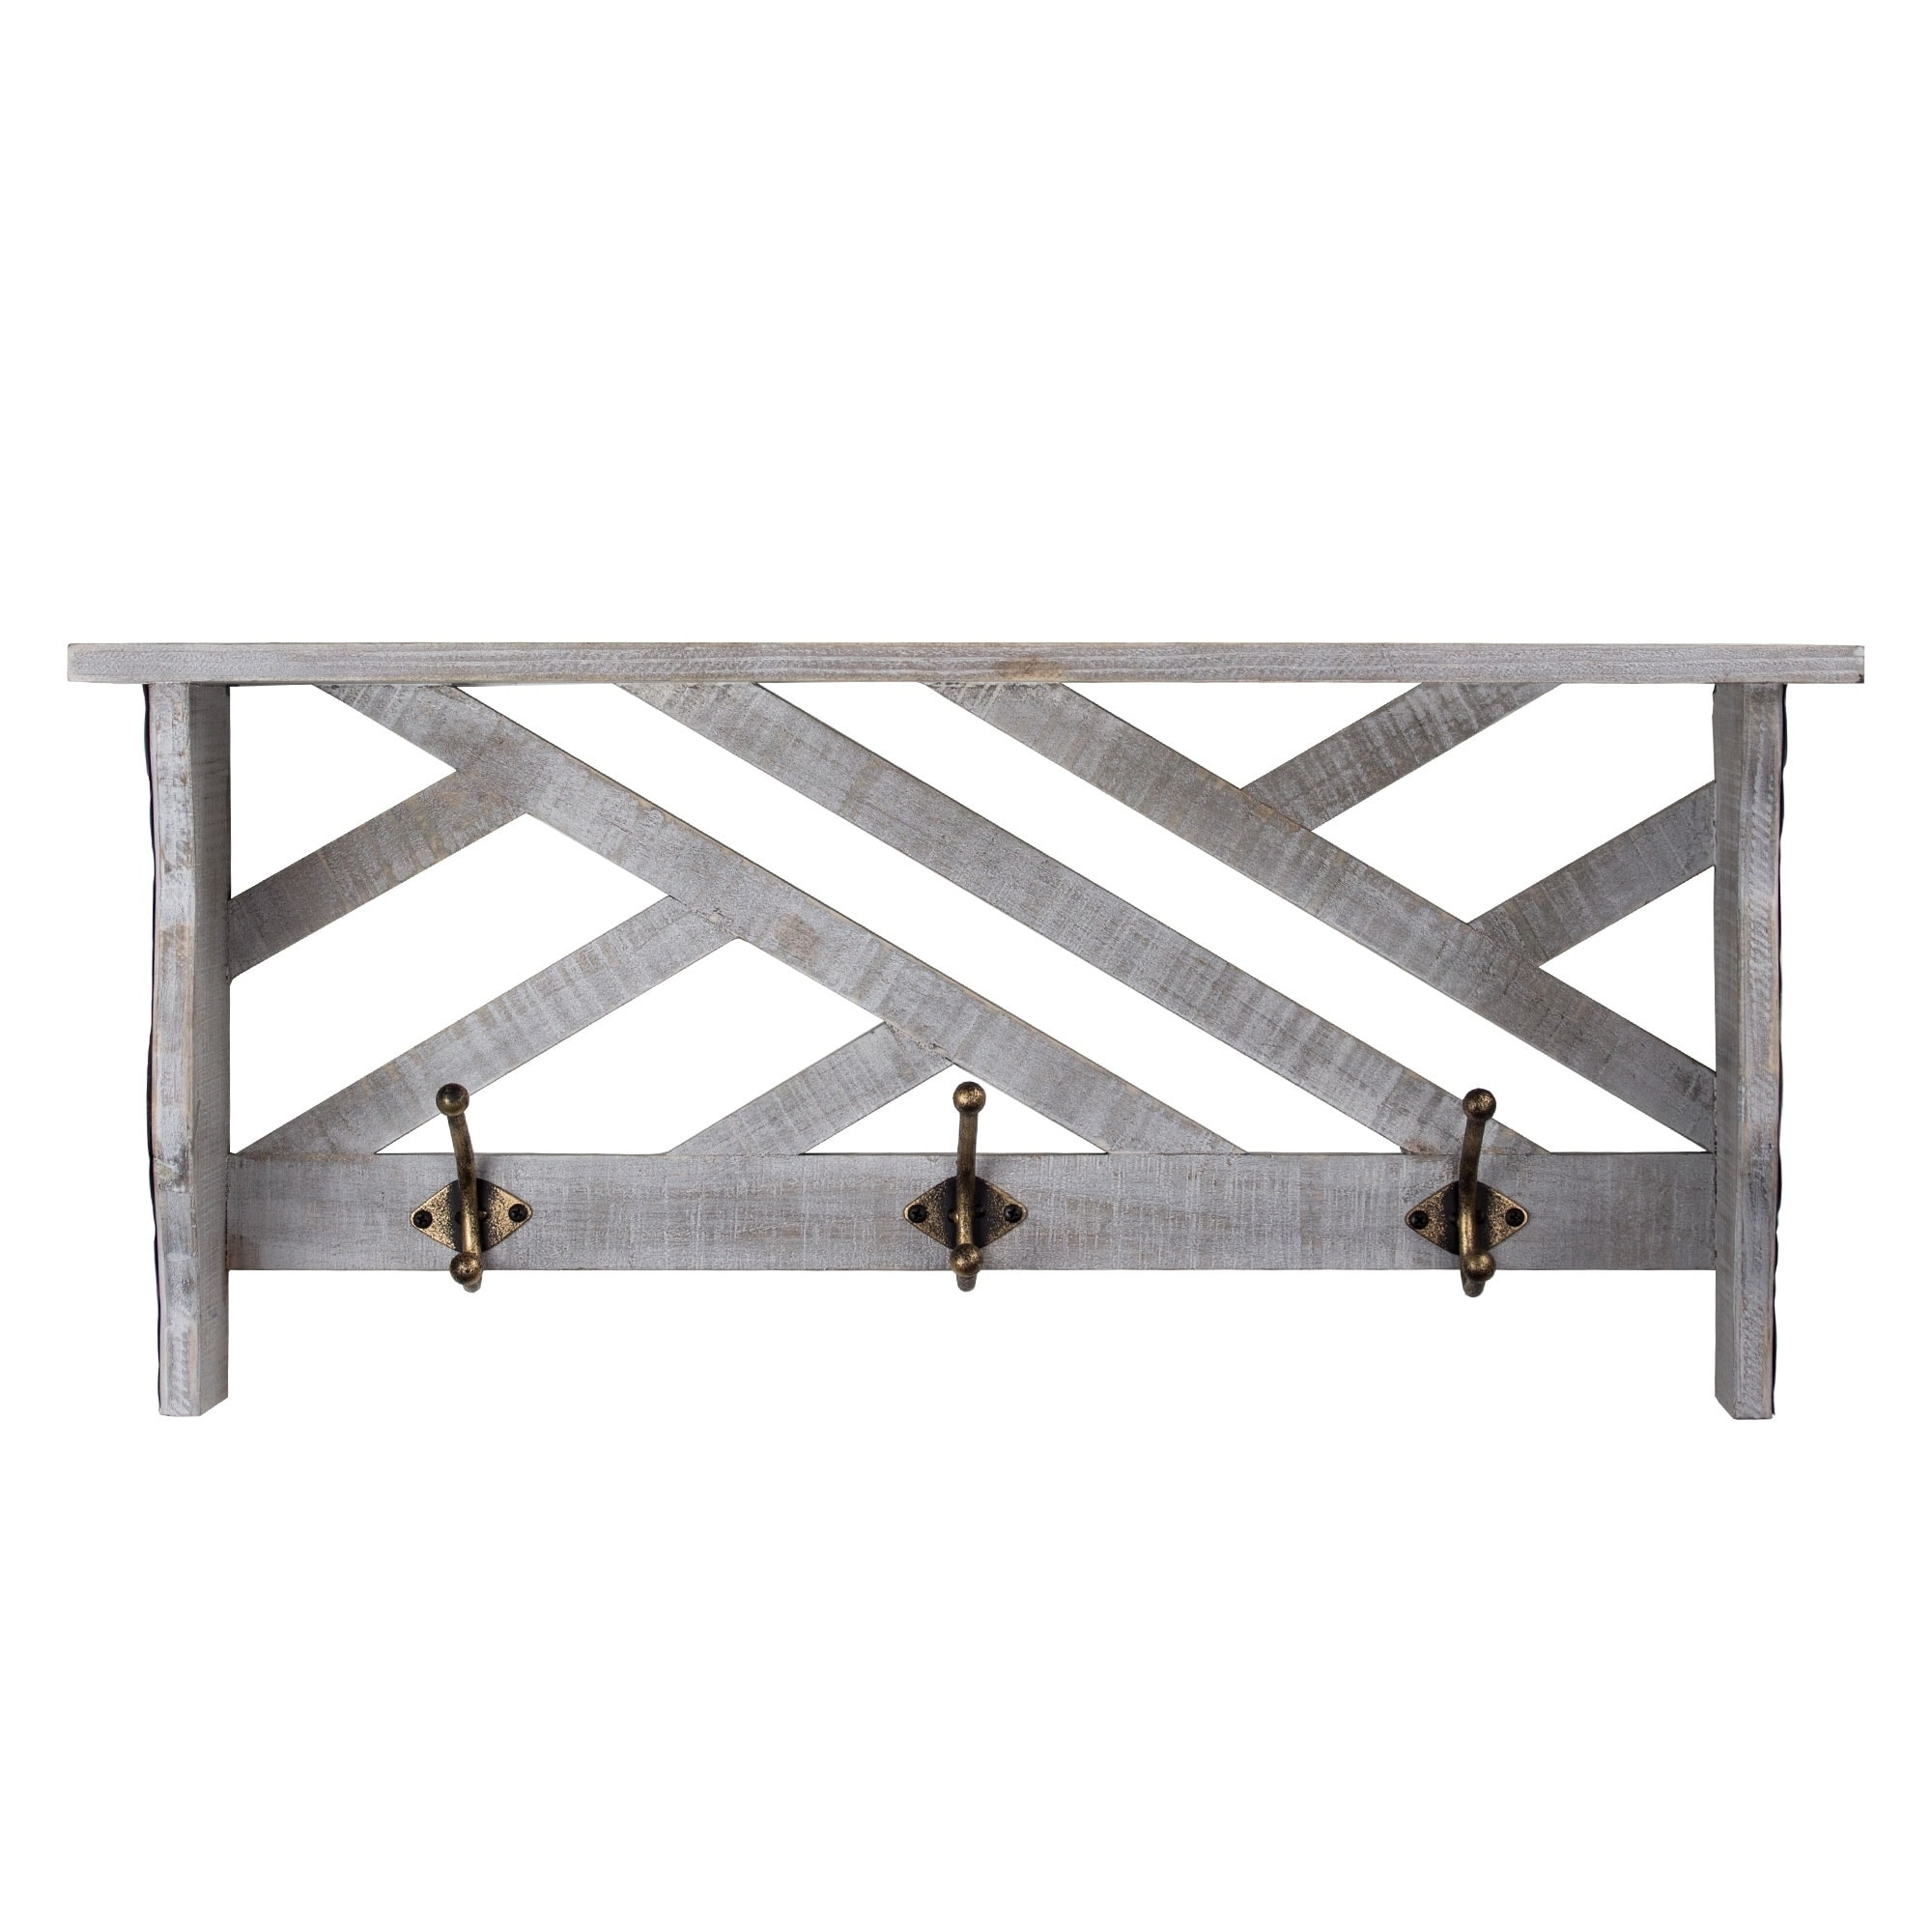 American Art Decor Rustic White Wall Mounted Coat Rack Wooden Shelf